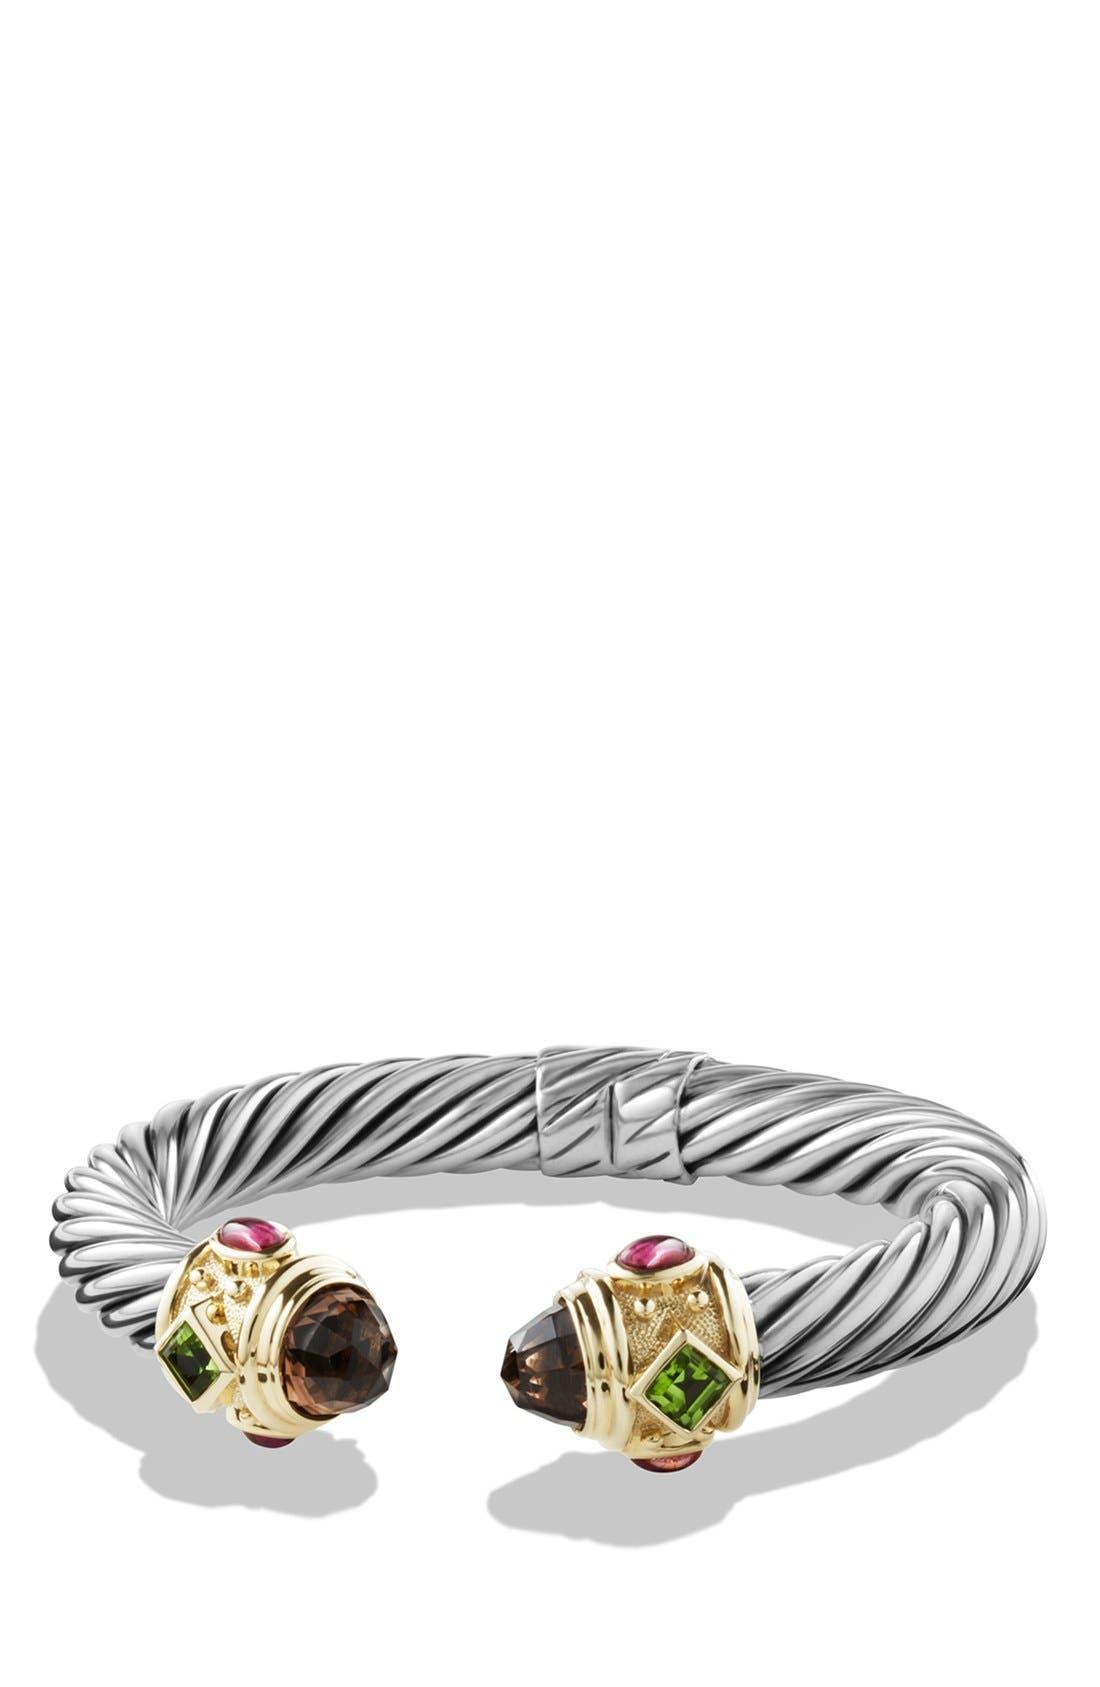 David Yurman 'Renaissance' Bracelet with Semiprecious Stones & Gold